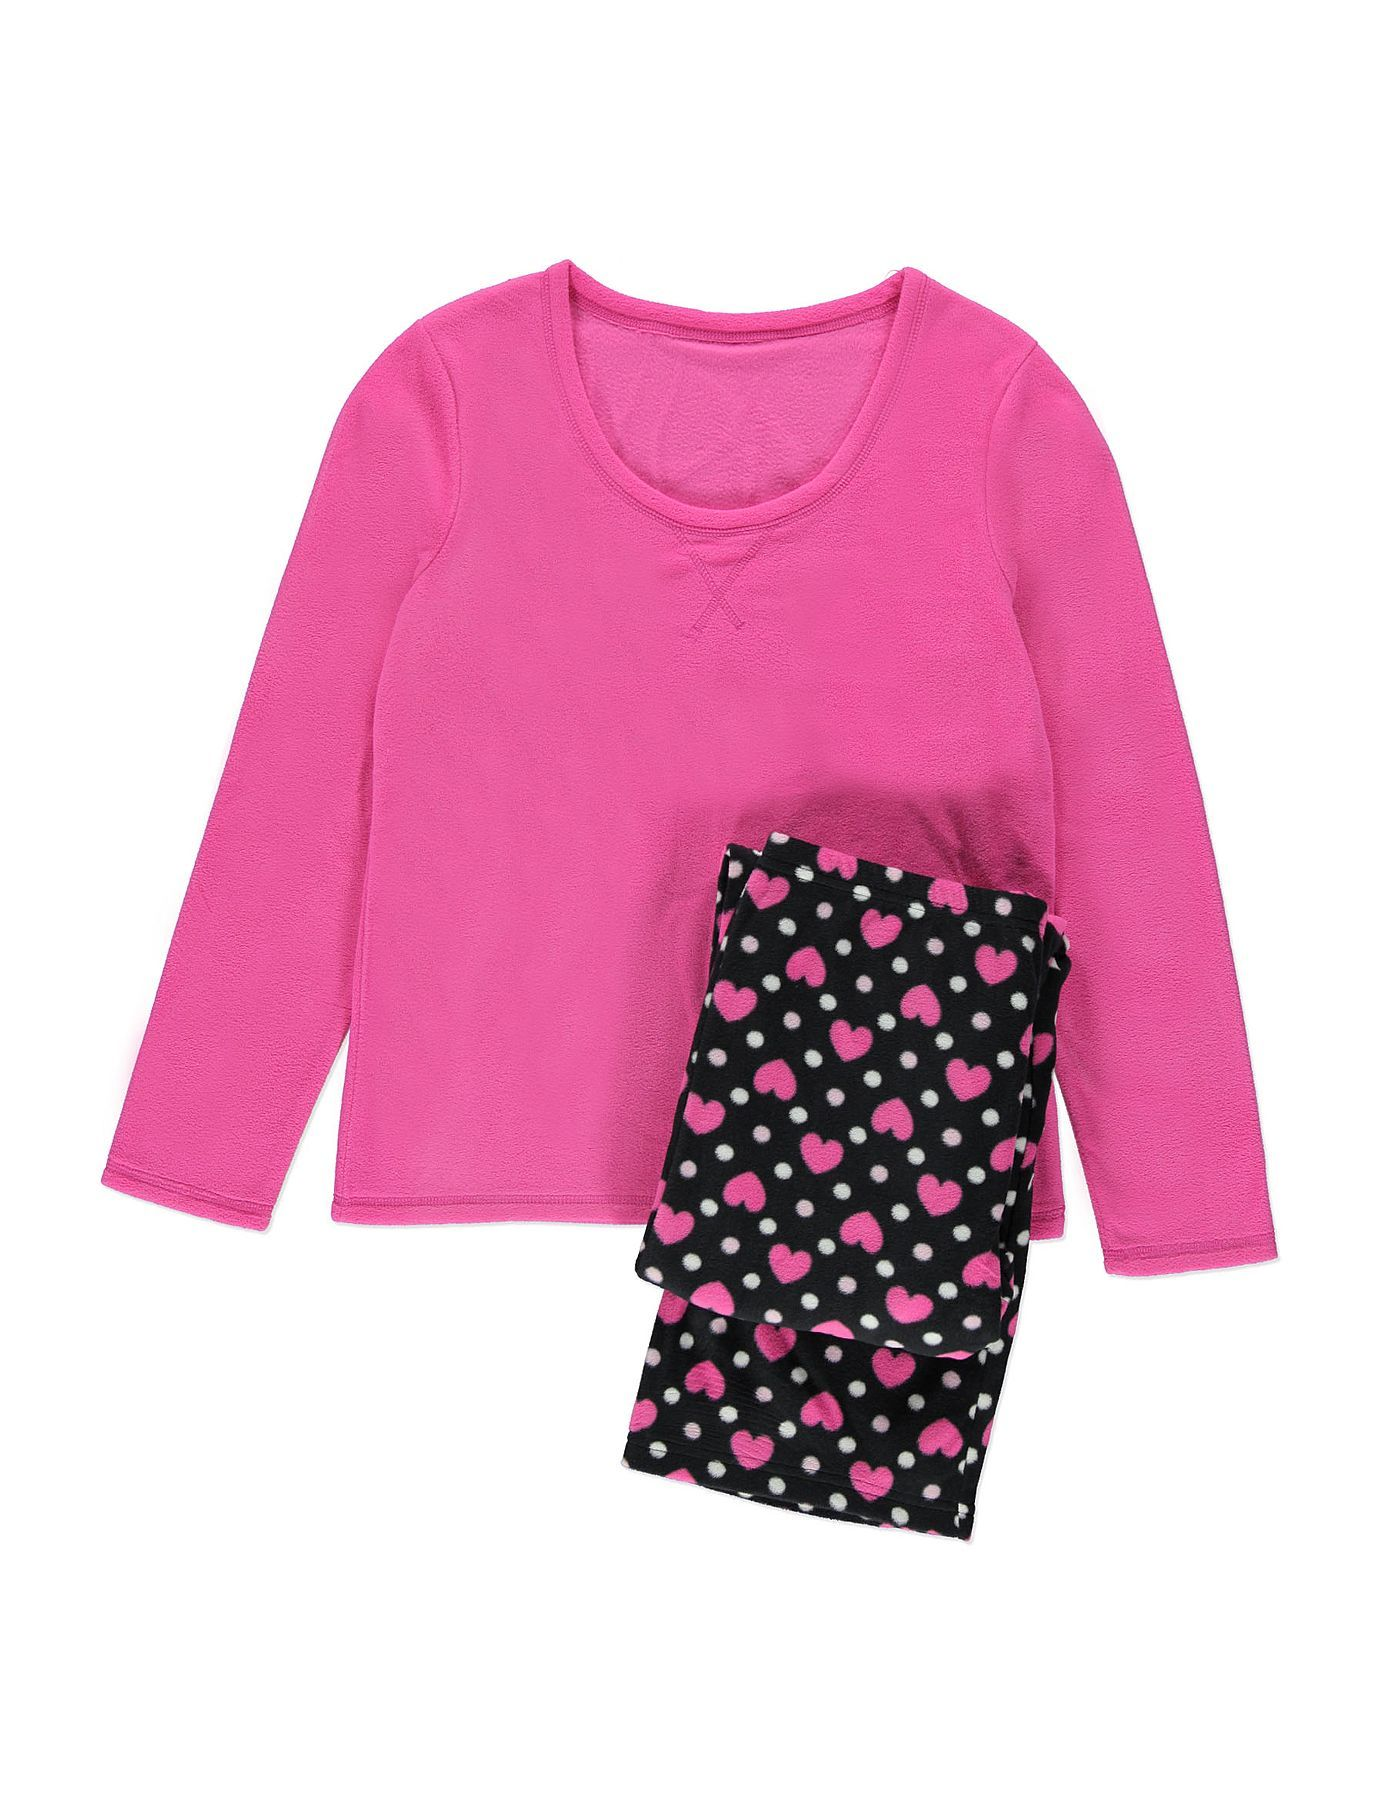 Heart Fleece Long Sleeve Pyjamas Women at ASDA